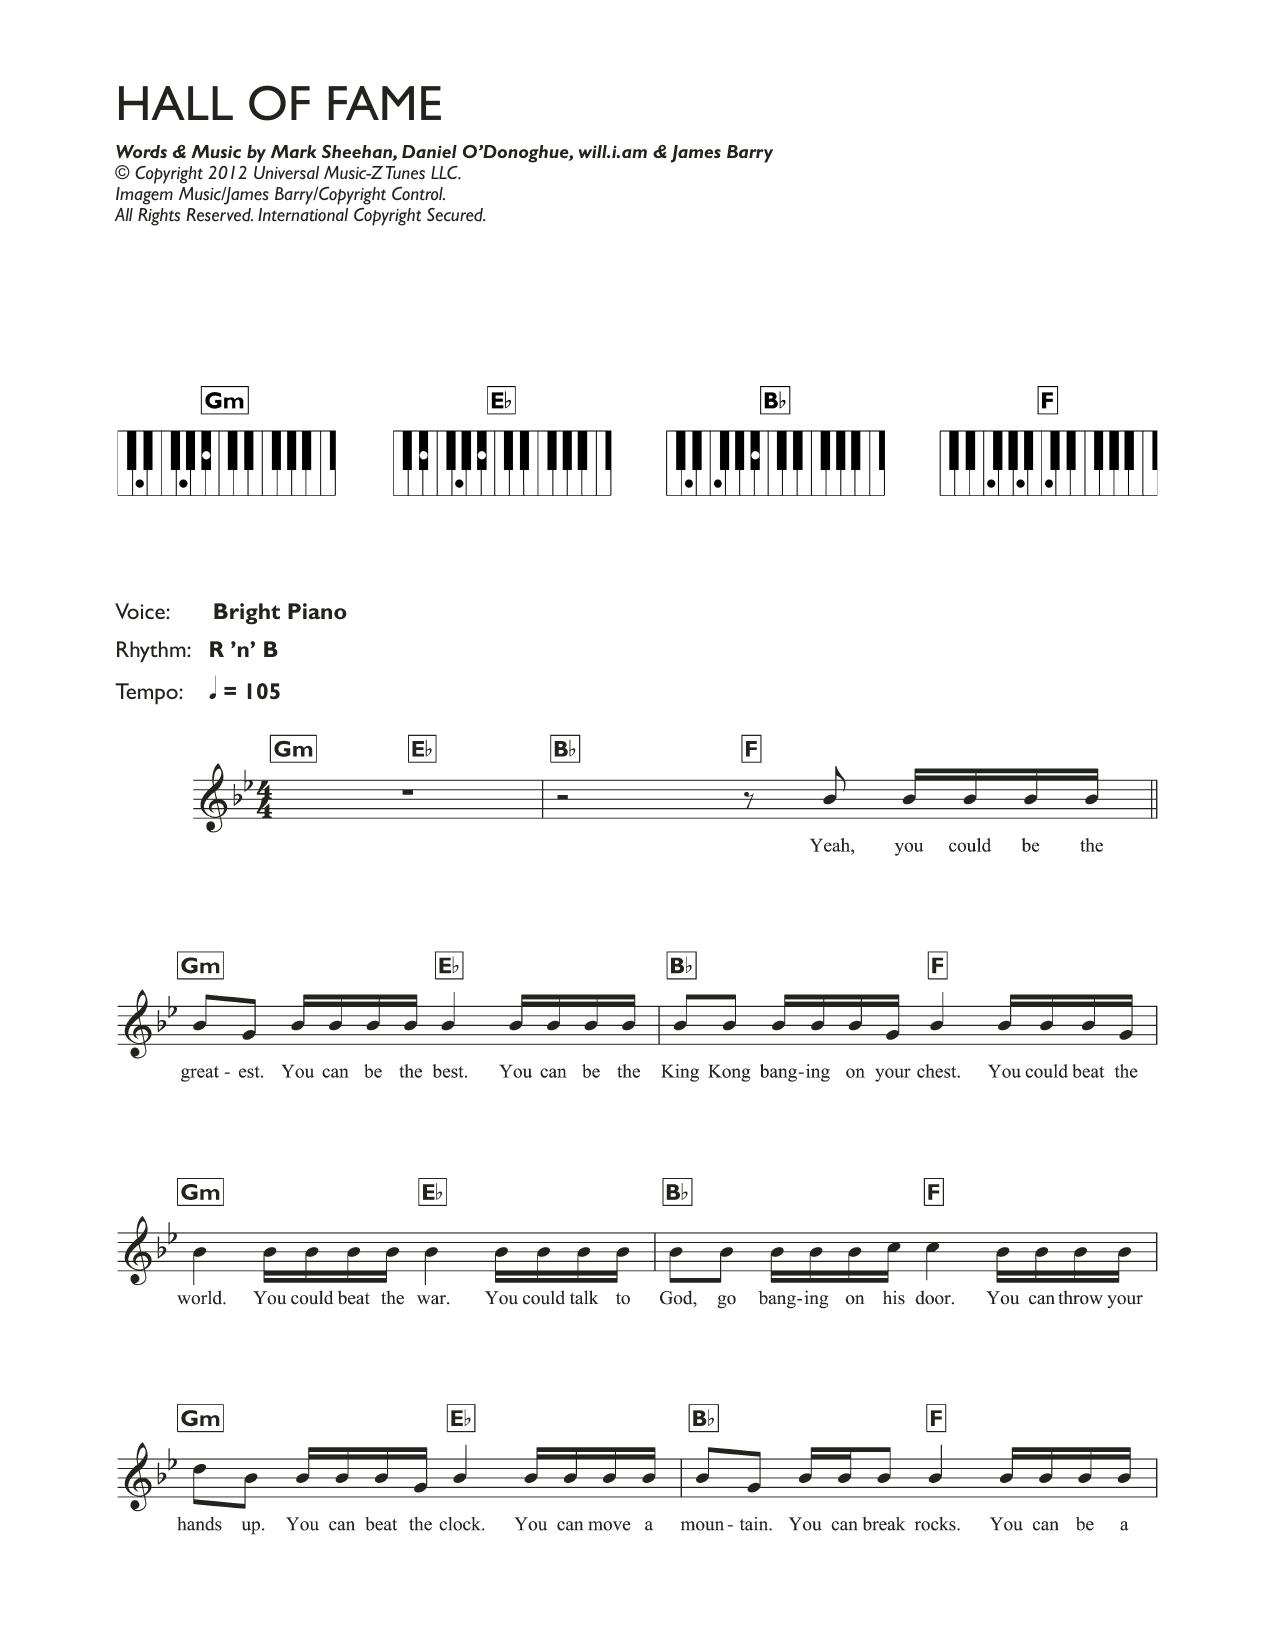 Sheet Music Digital Files To Print Licensed Daniel Odonoghue